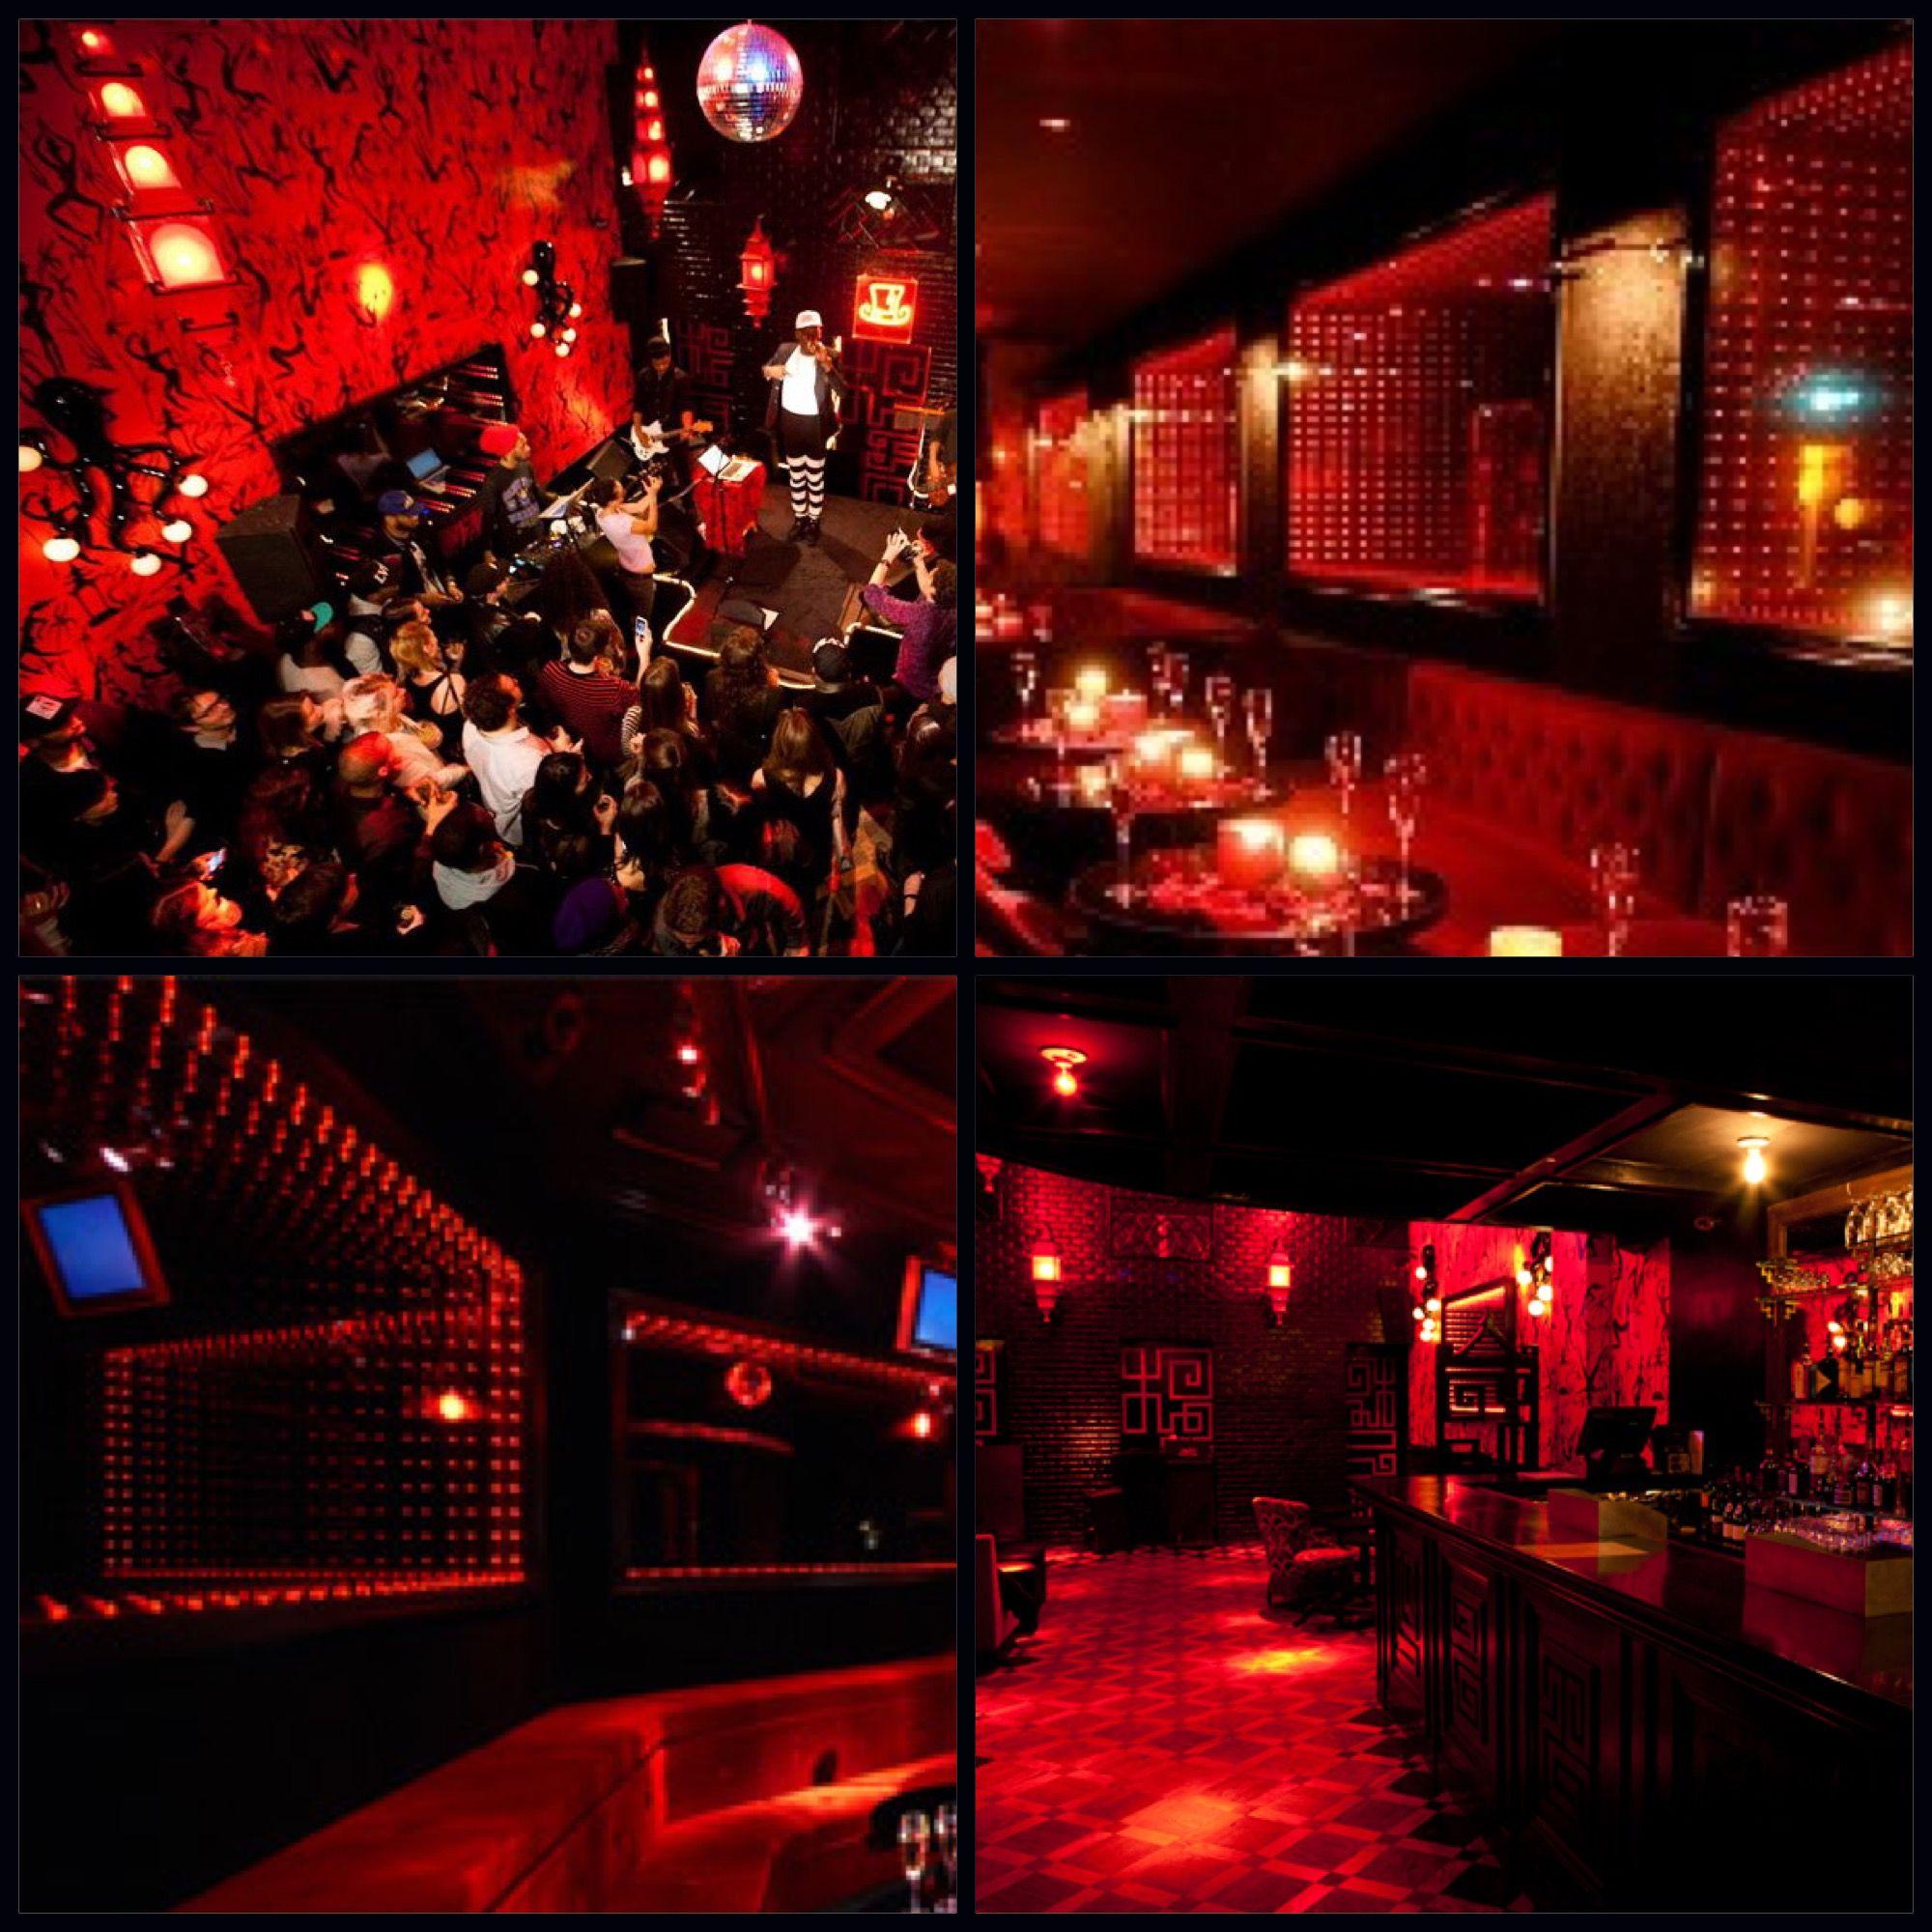 Le Baron Paris Nightclub